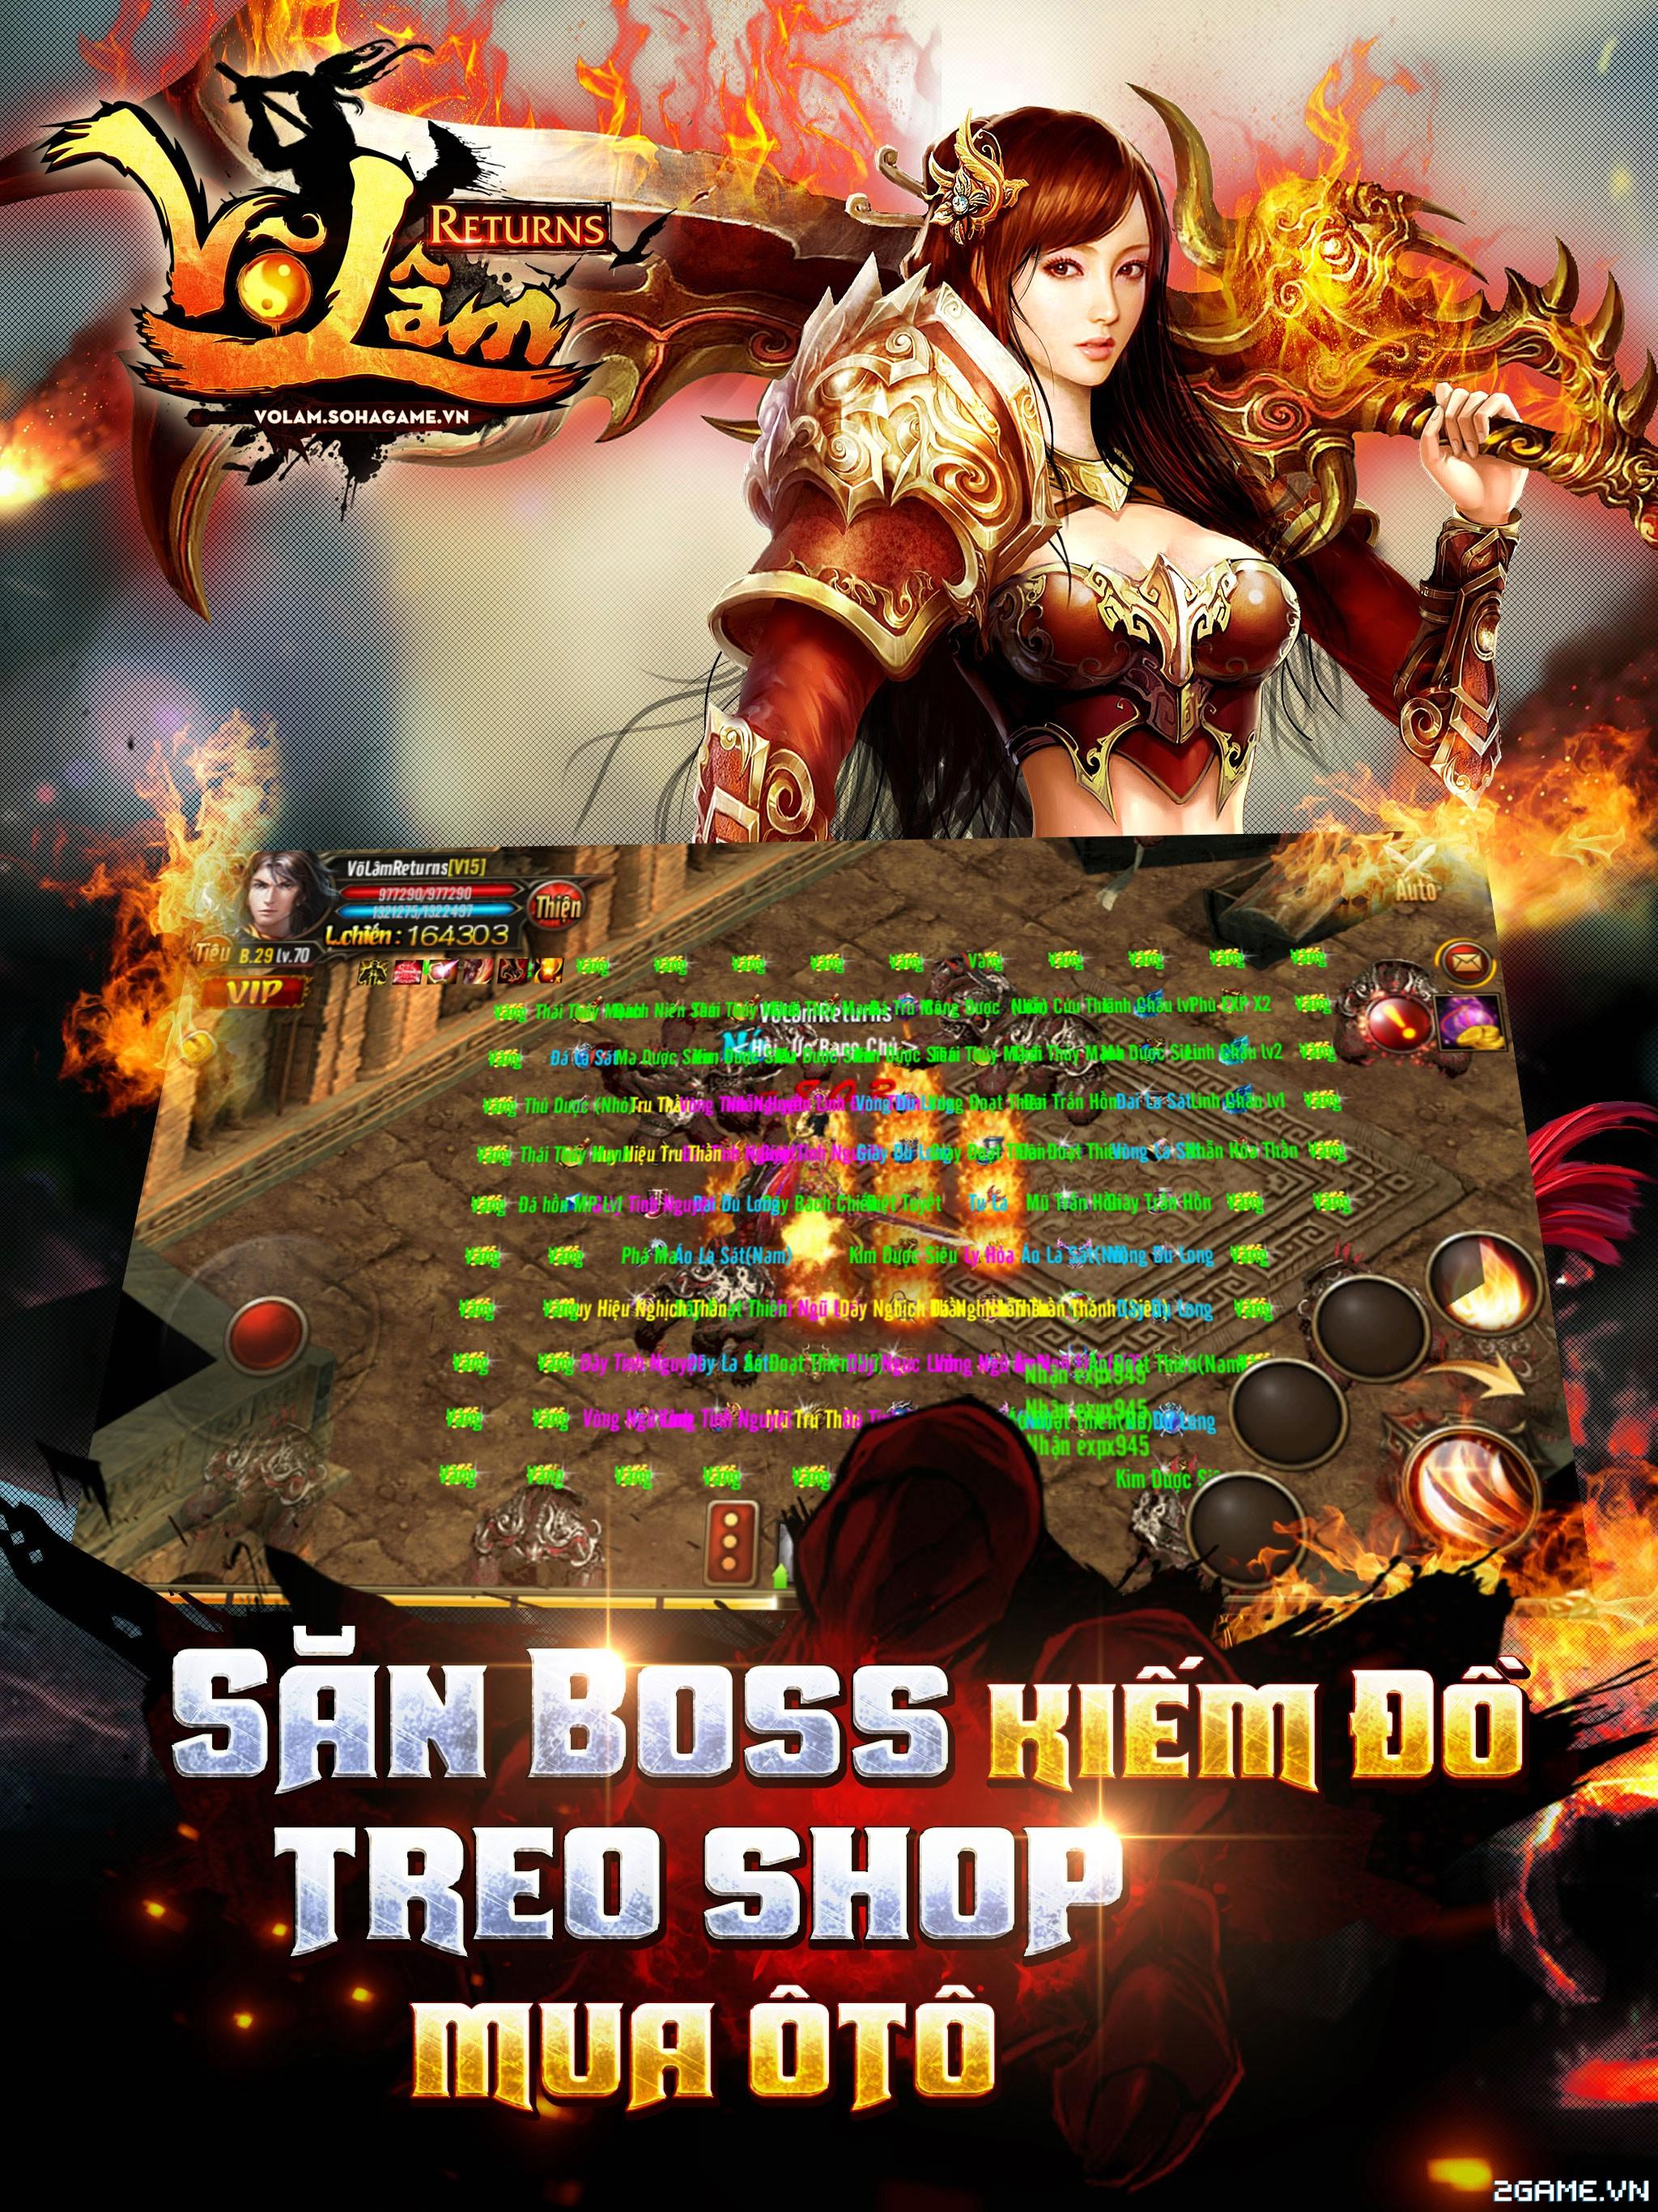 Võ Lâm Returns – Săn Boss